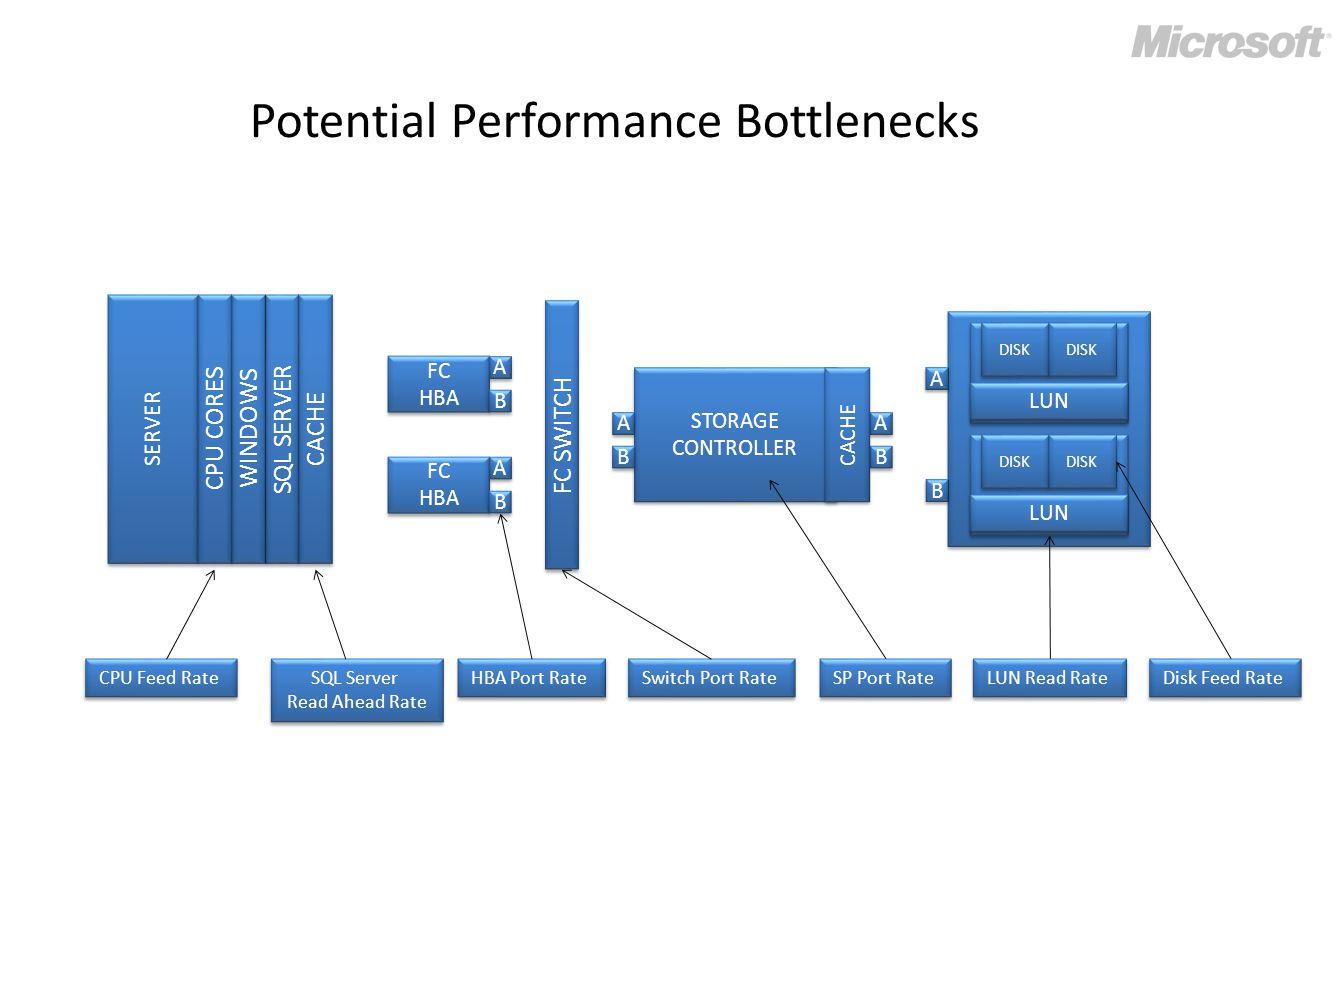 Potential Performance Bottlenecks FC HBA FC HBA A A B B FC HBA FC HBA A A B B FC SWITCH STORAGE CONTROLLER STORAGE CONTROLLER A A B B A A B B CACHE SE